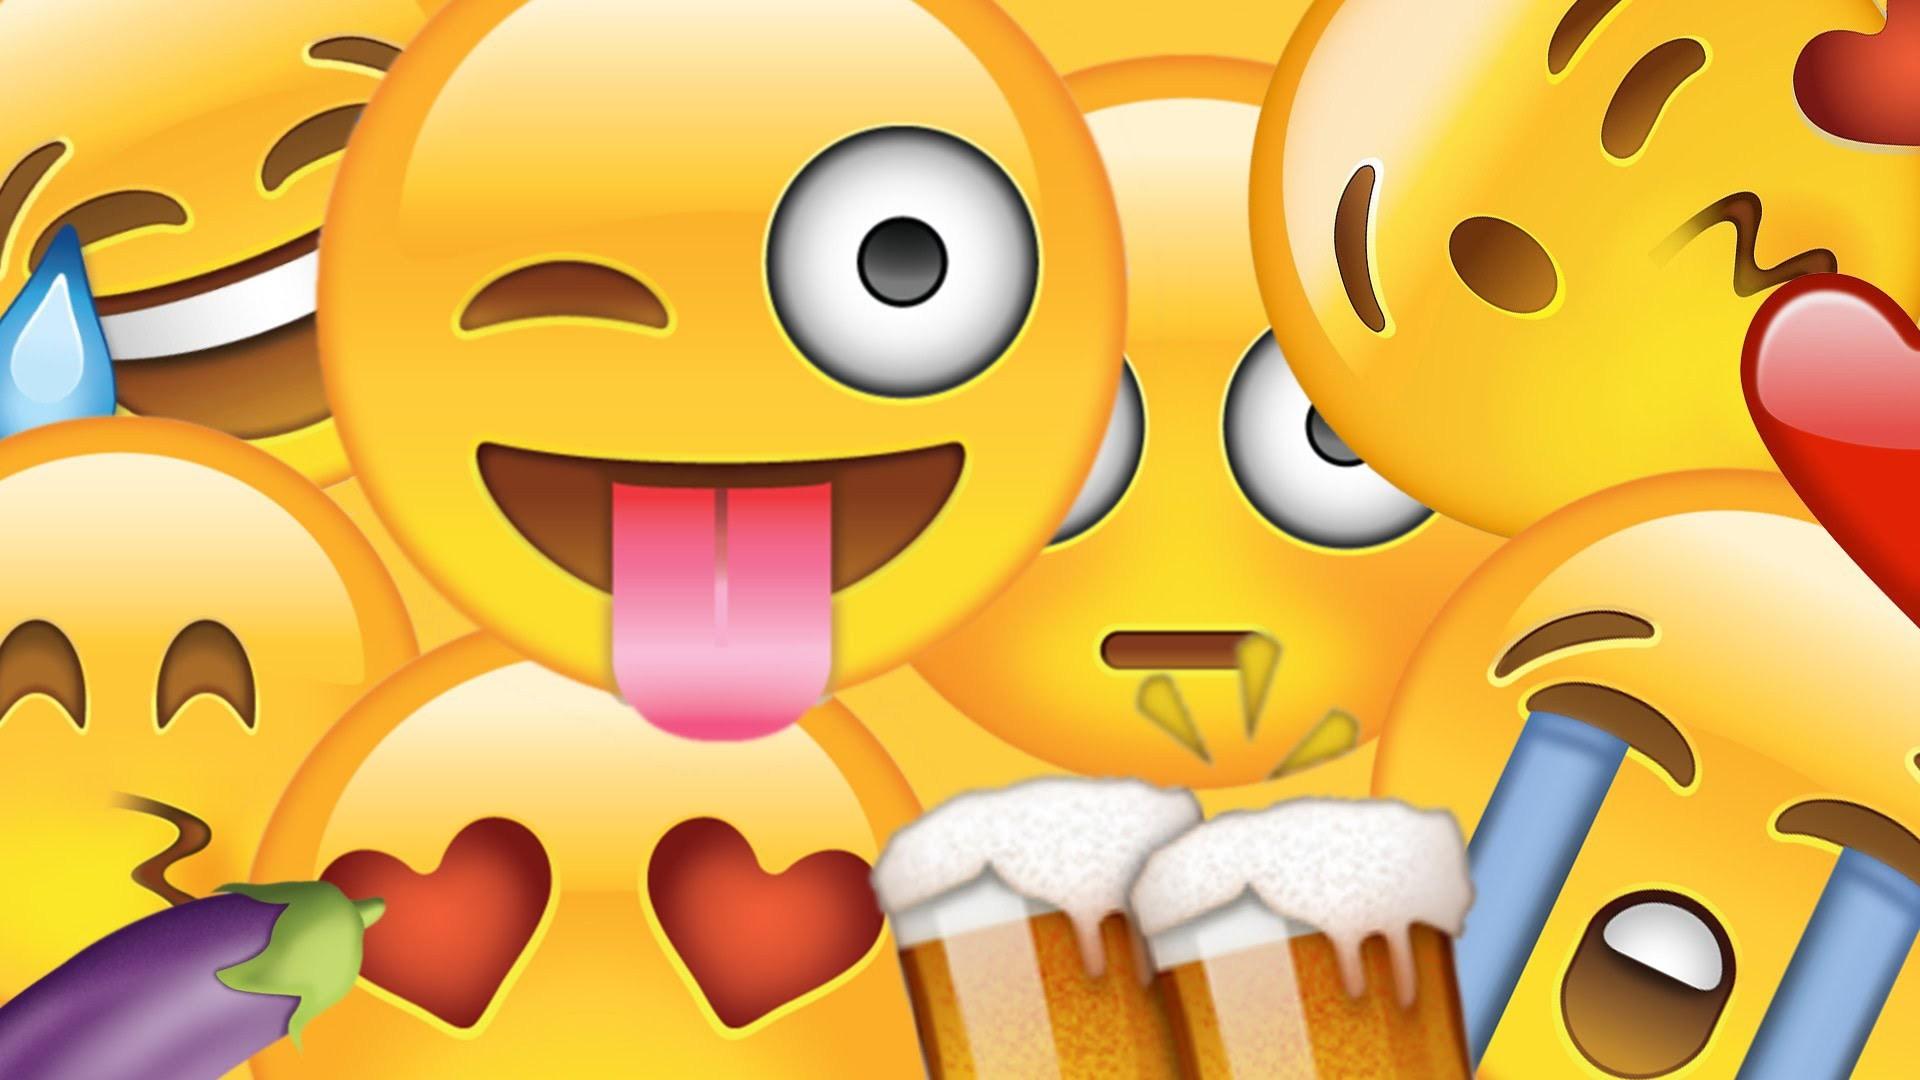 emoji wallpaper  u00b7 u2460 download free amazing high resolution